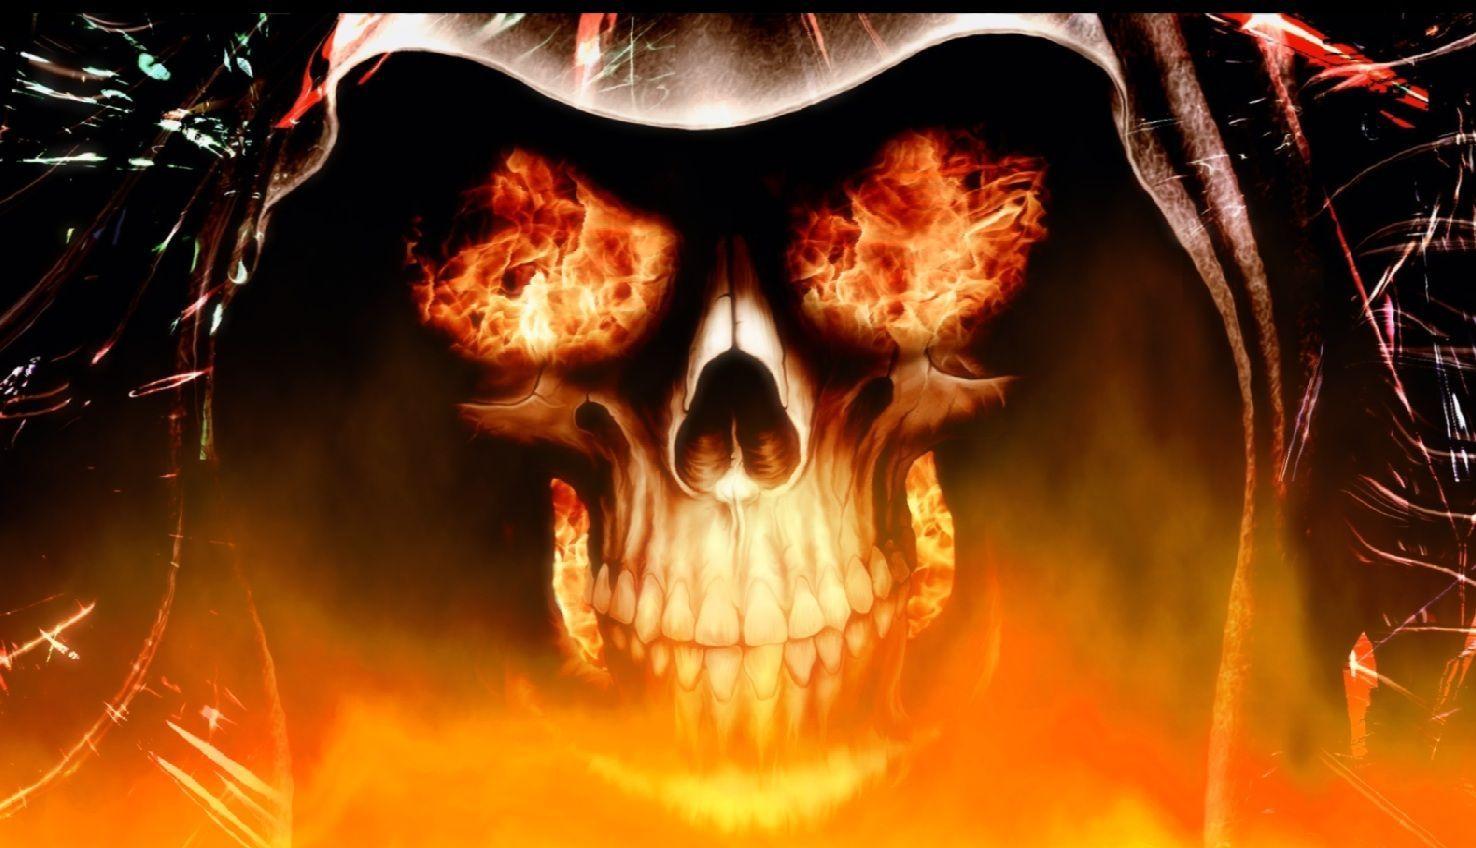 Skull Fire Wallpapers - Wallpaper Cave